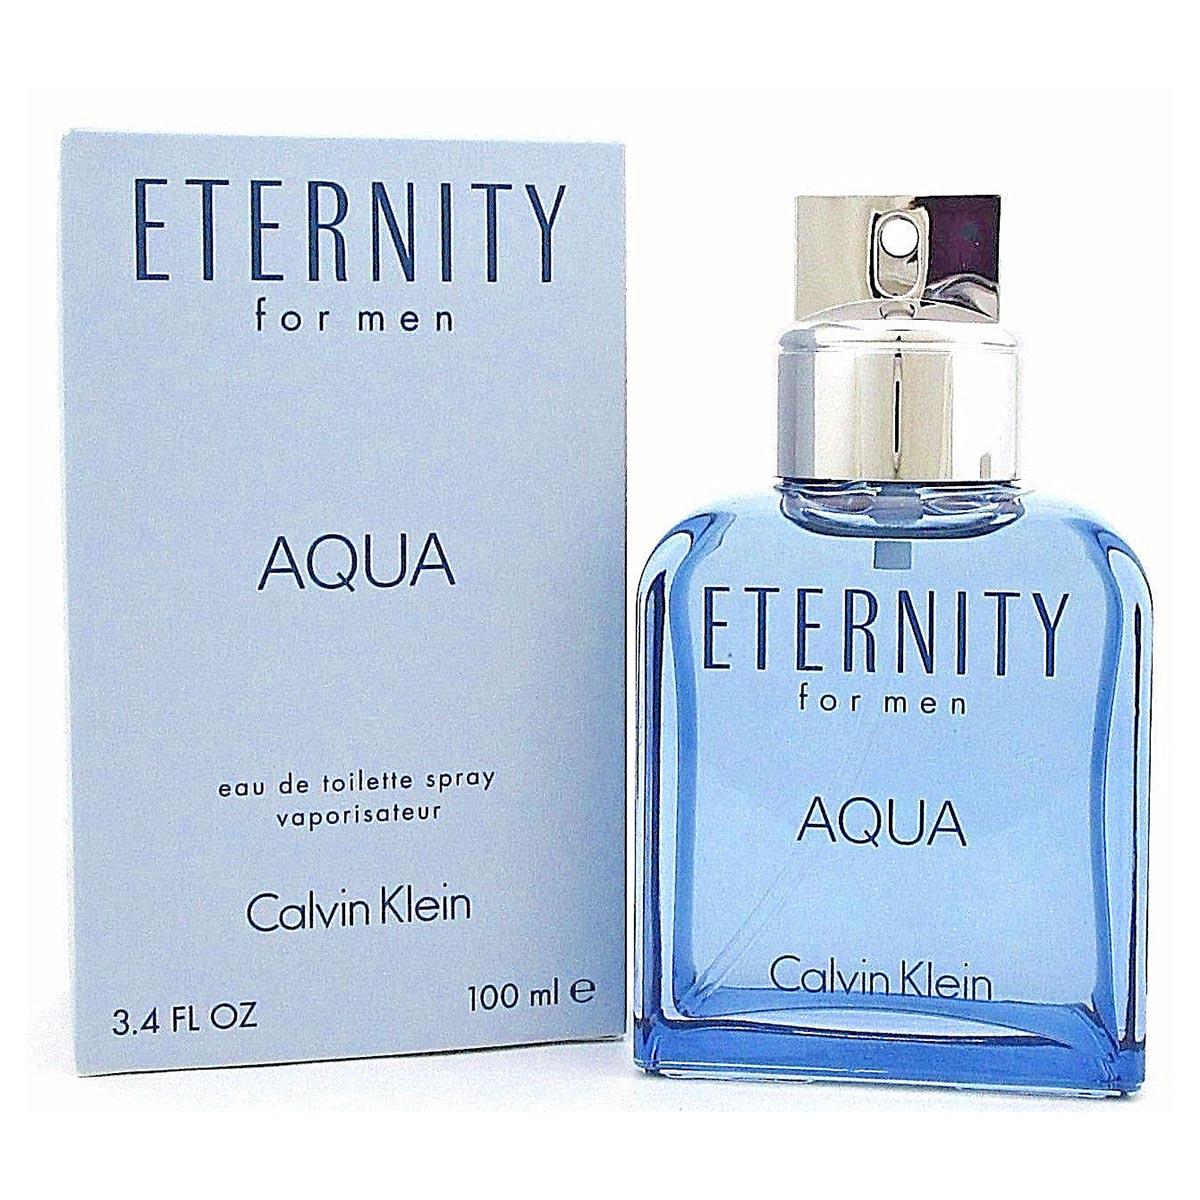 Calvin klein eternity aqua eau de toilette for men 100ml vaporizador